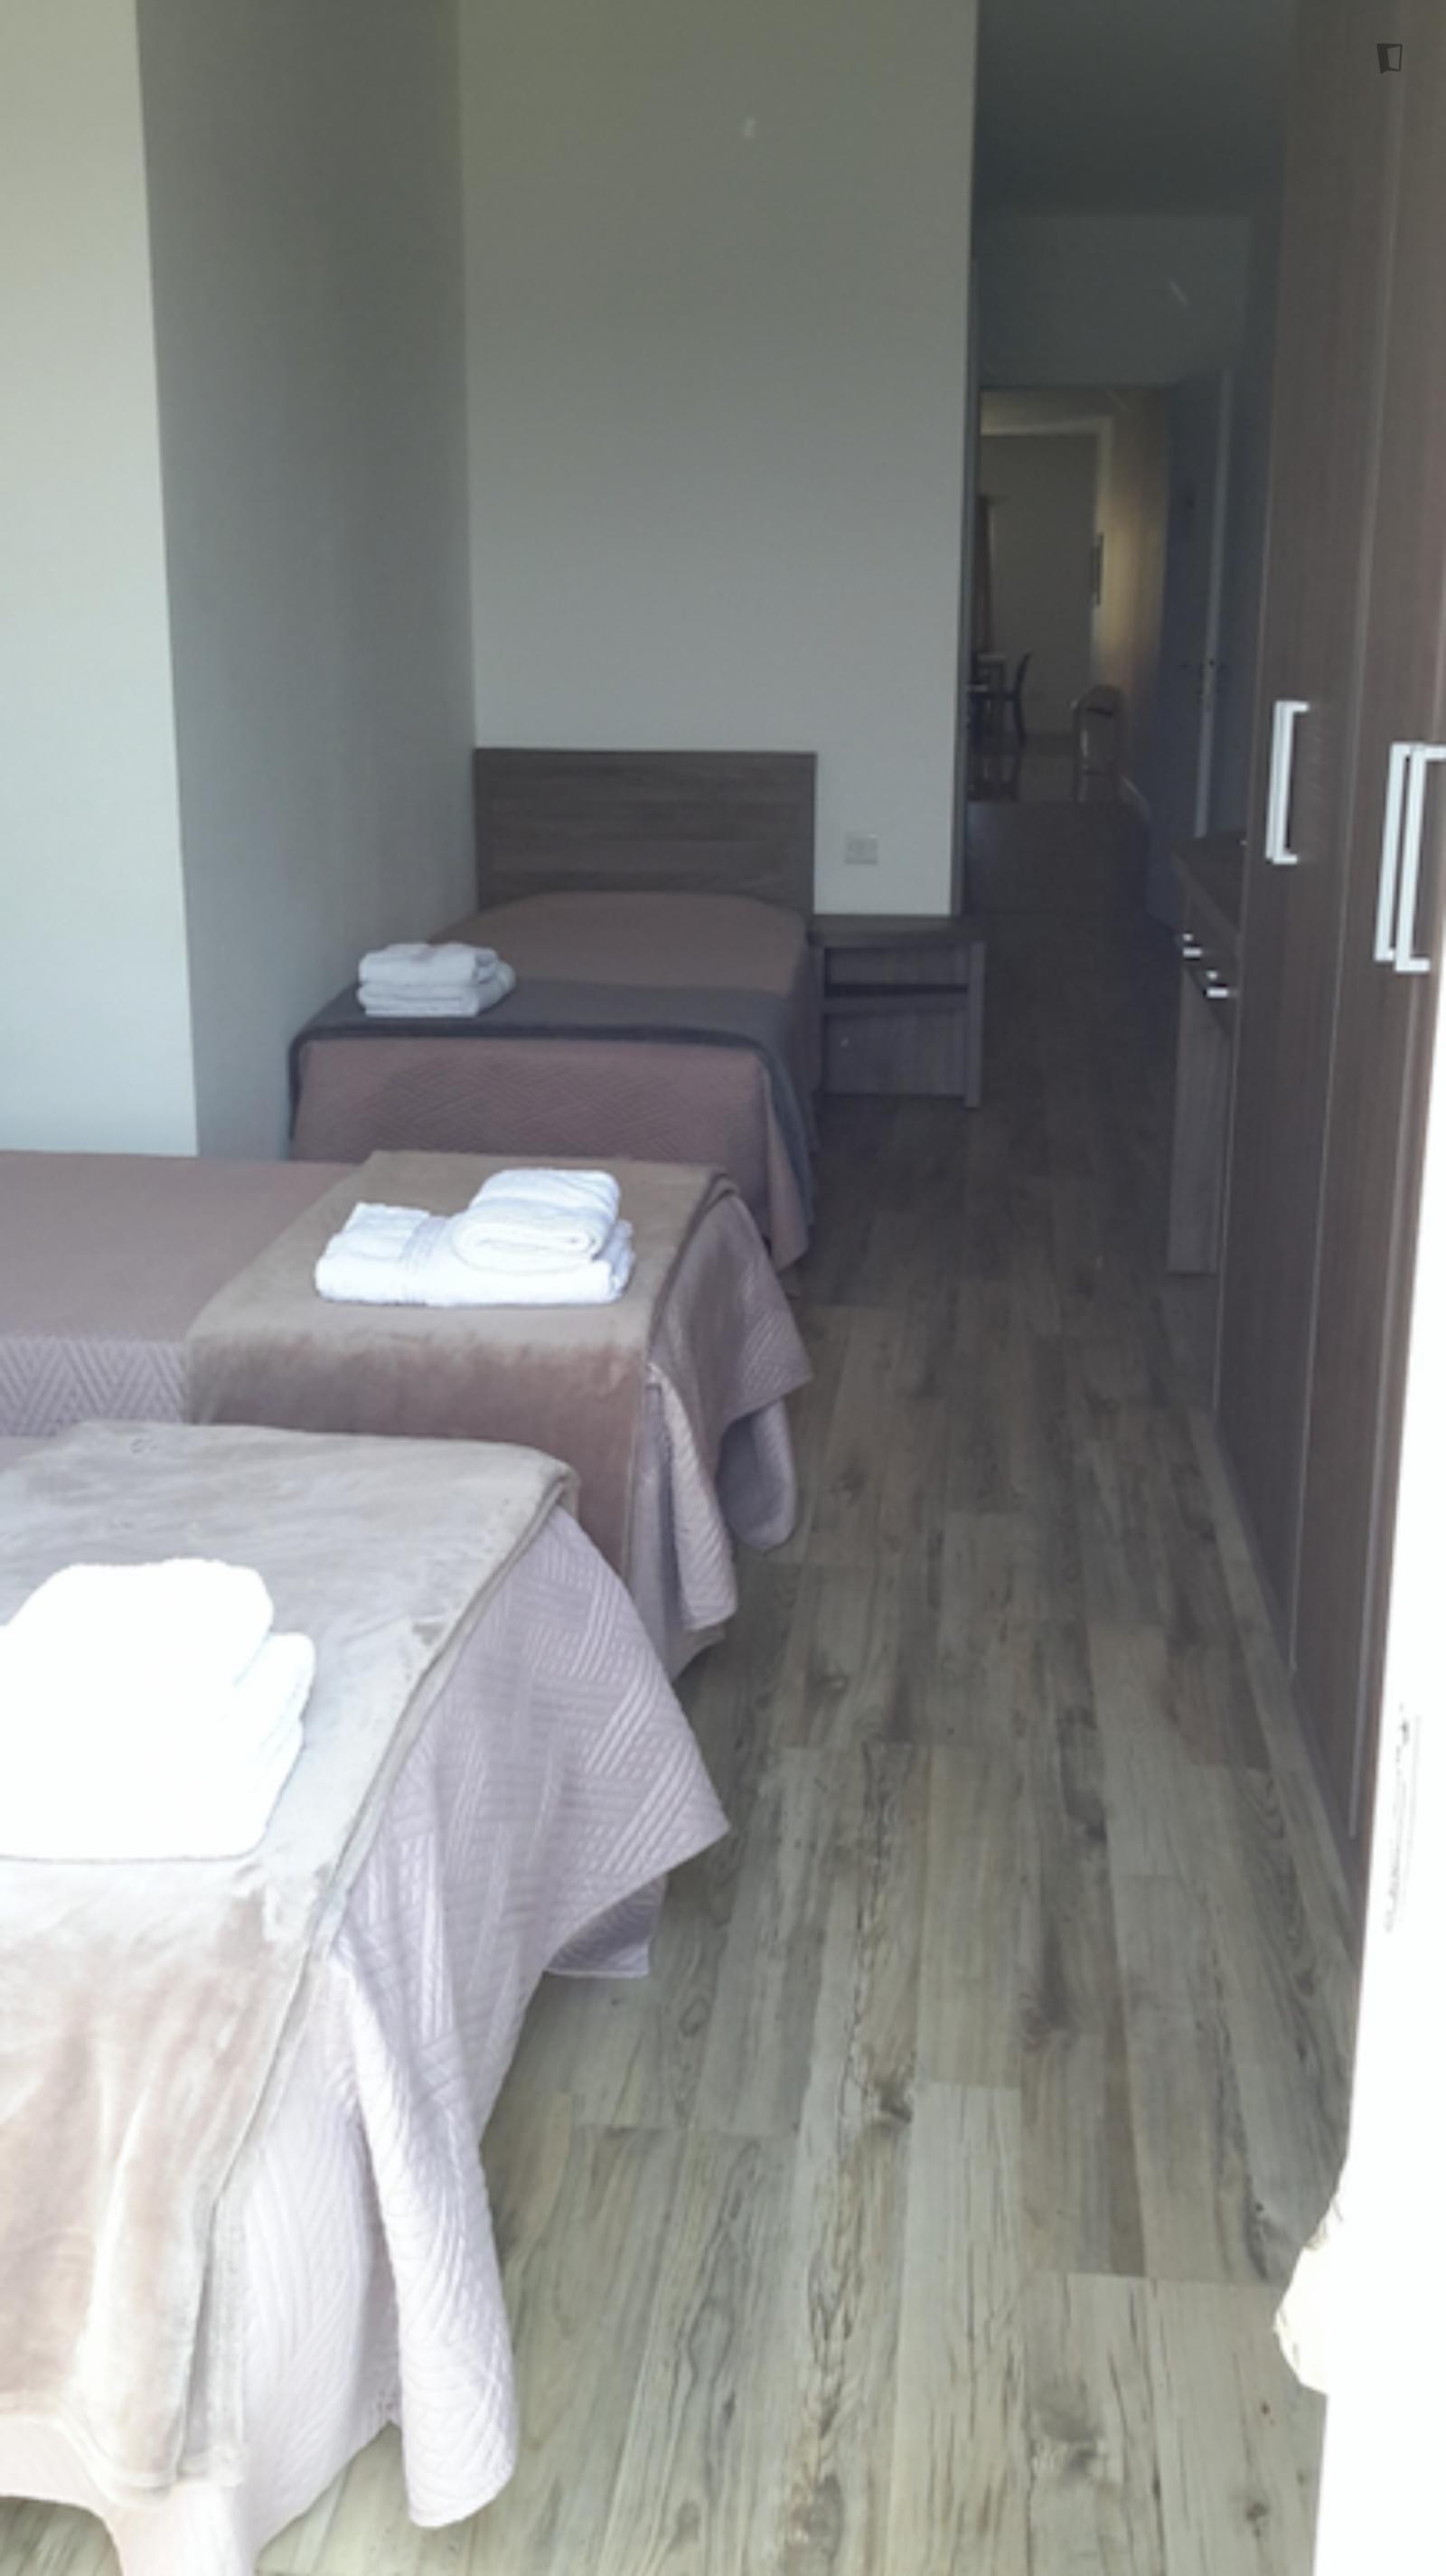 Triq Manwel Dimech, Sliema, MT-56 - 600 EUR/ month